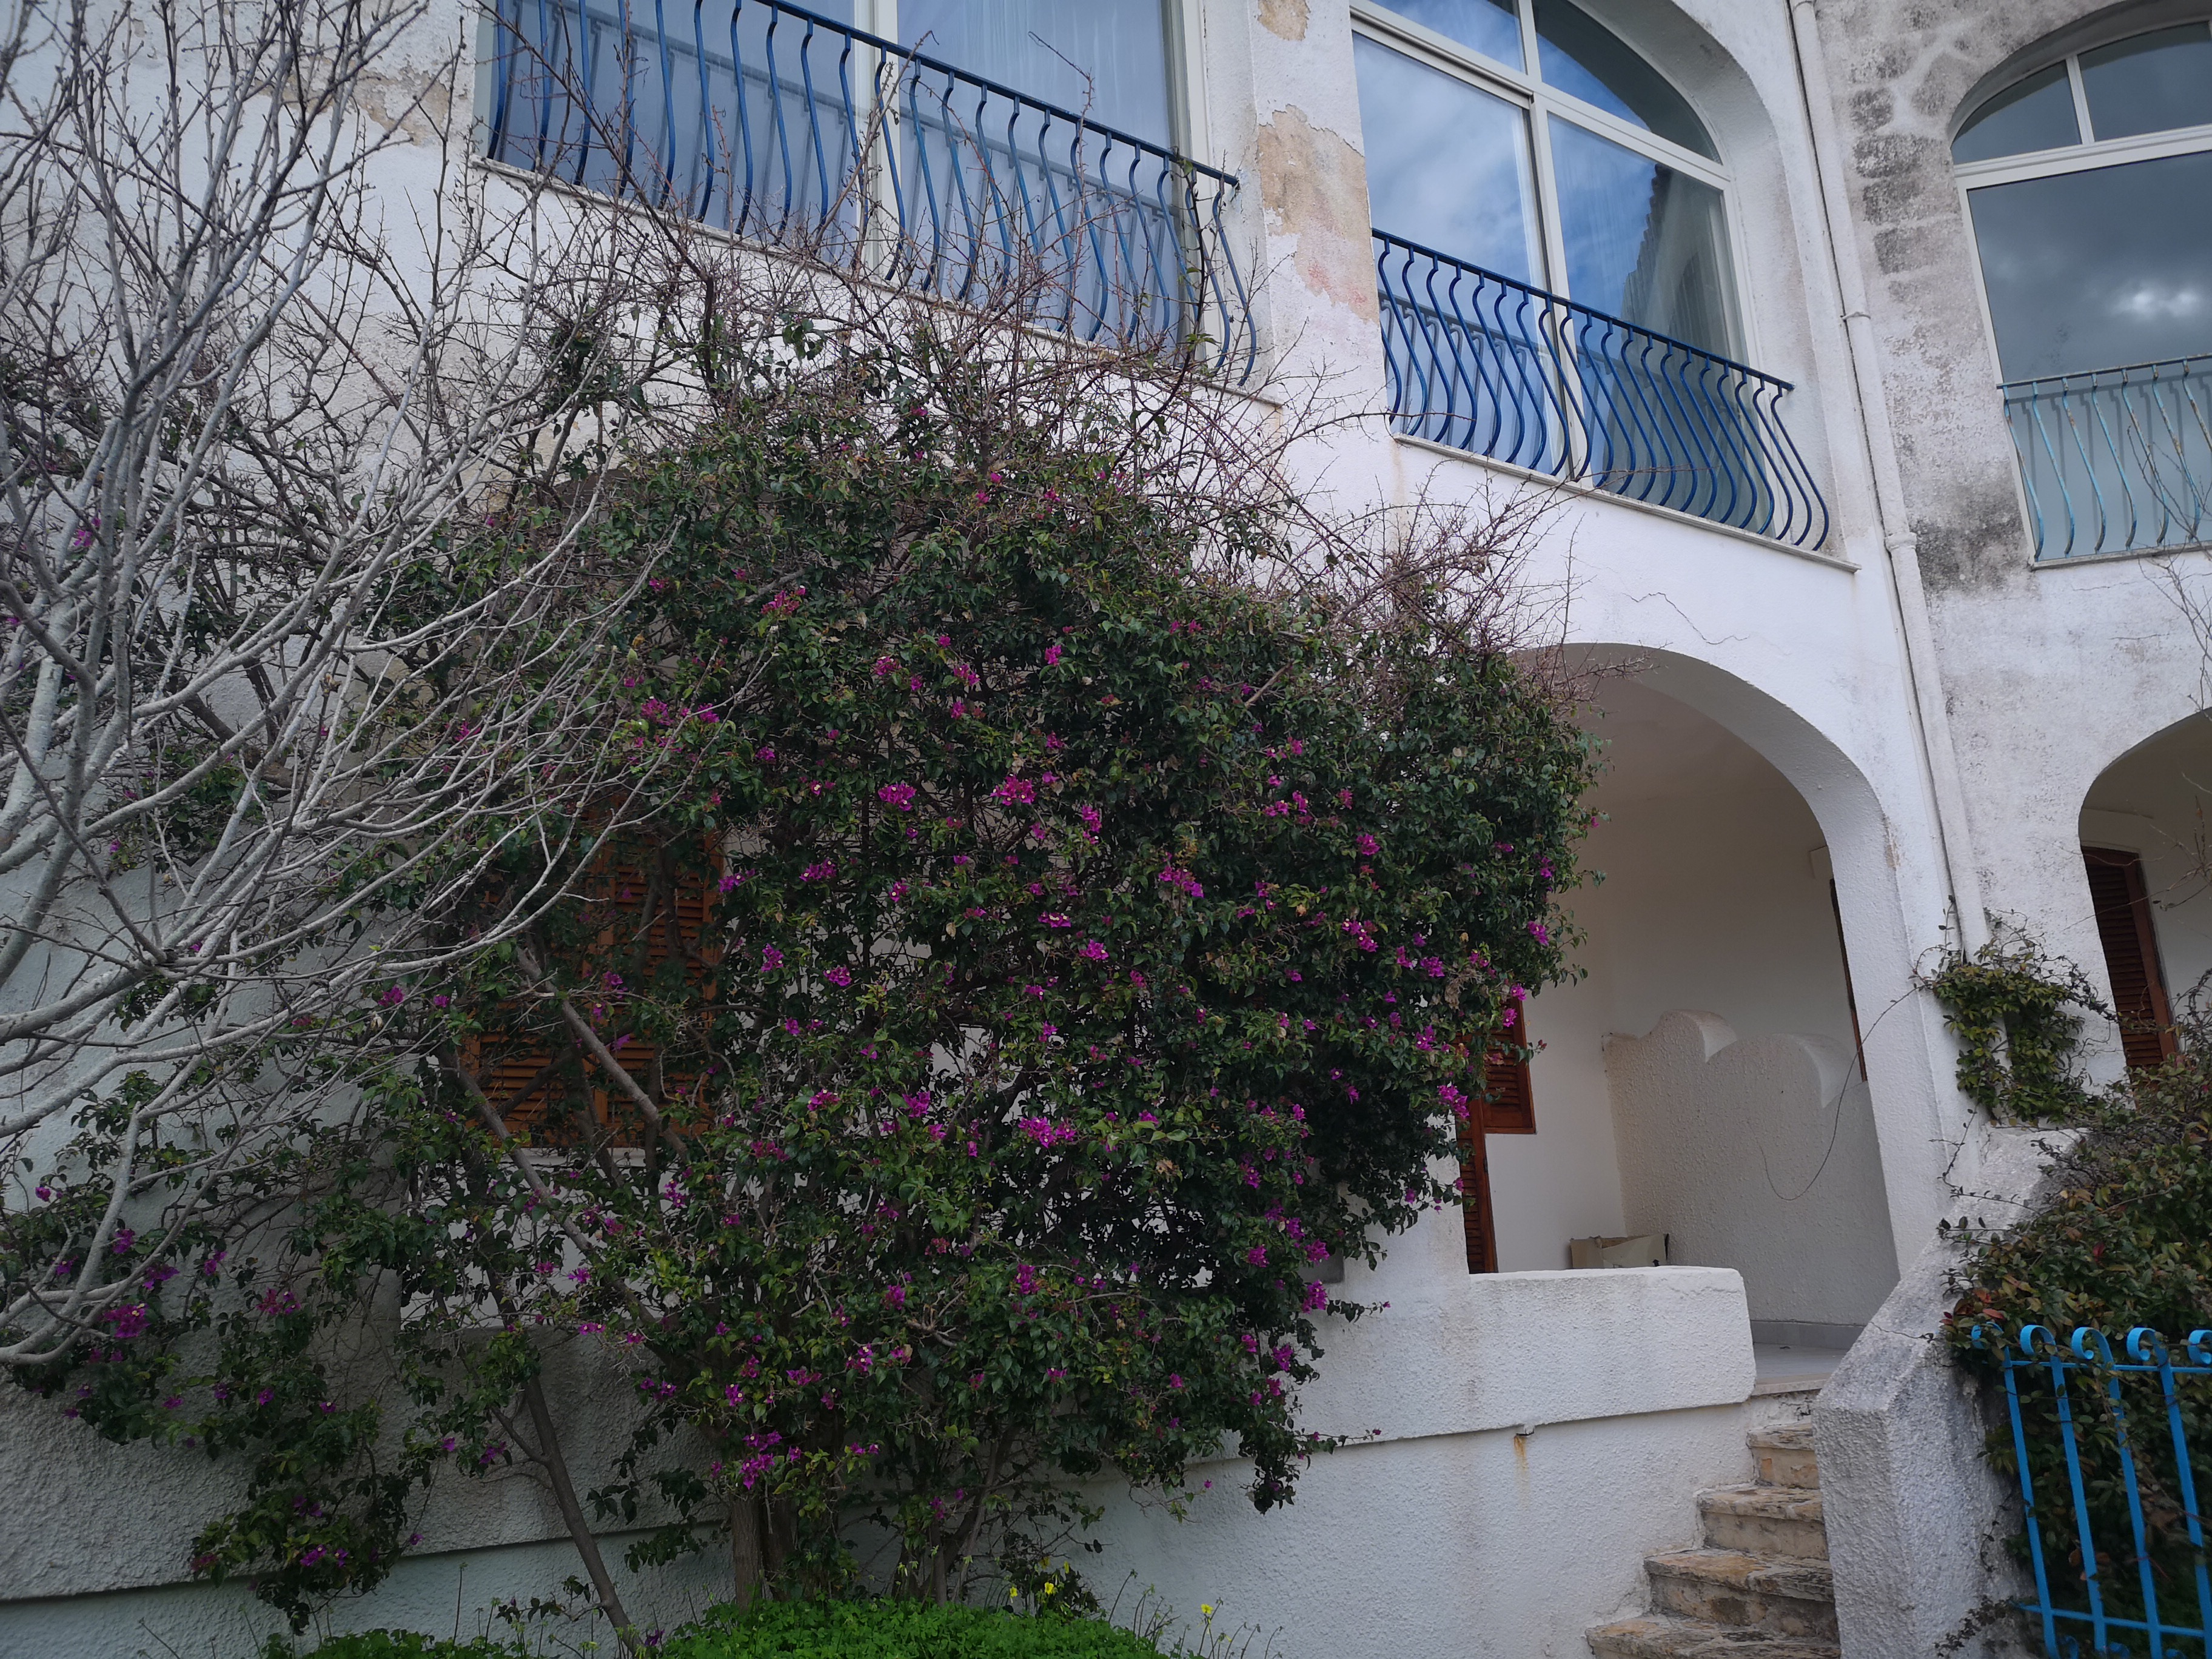 Appartamento, via Belvedere, centro, Vendita - Santa Cesarea Terme (LE)